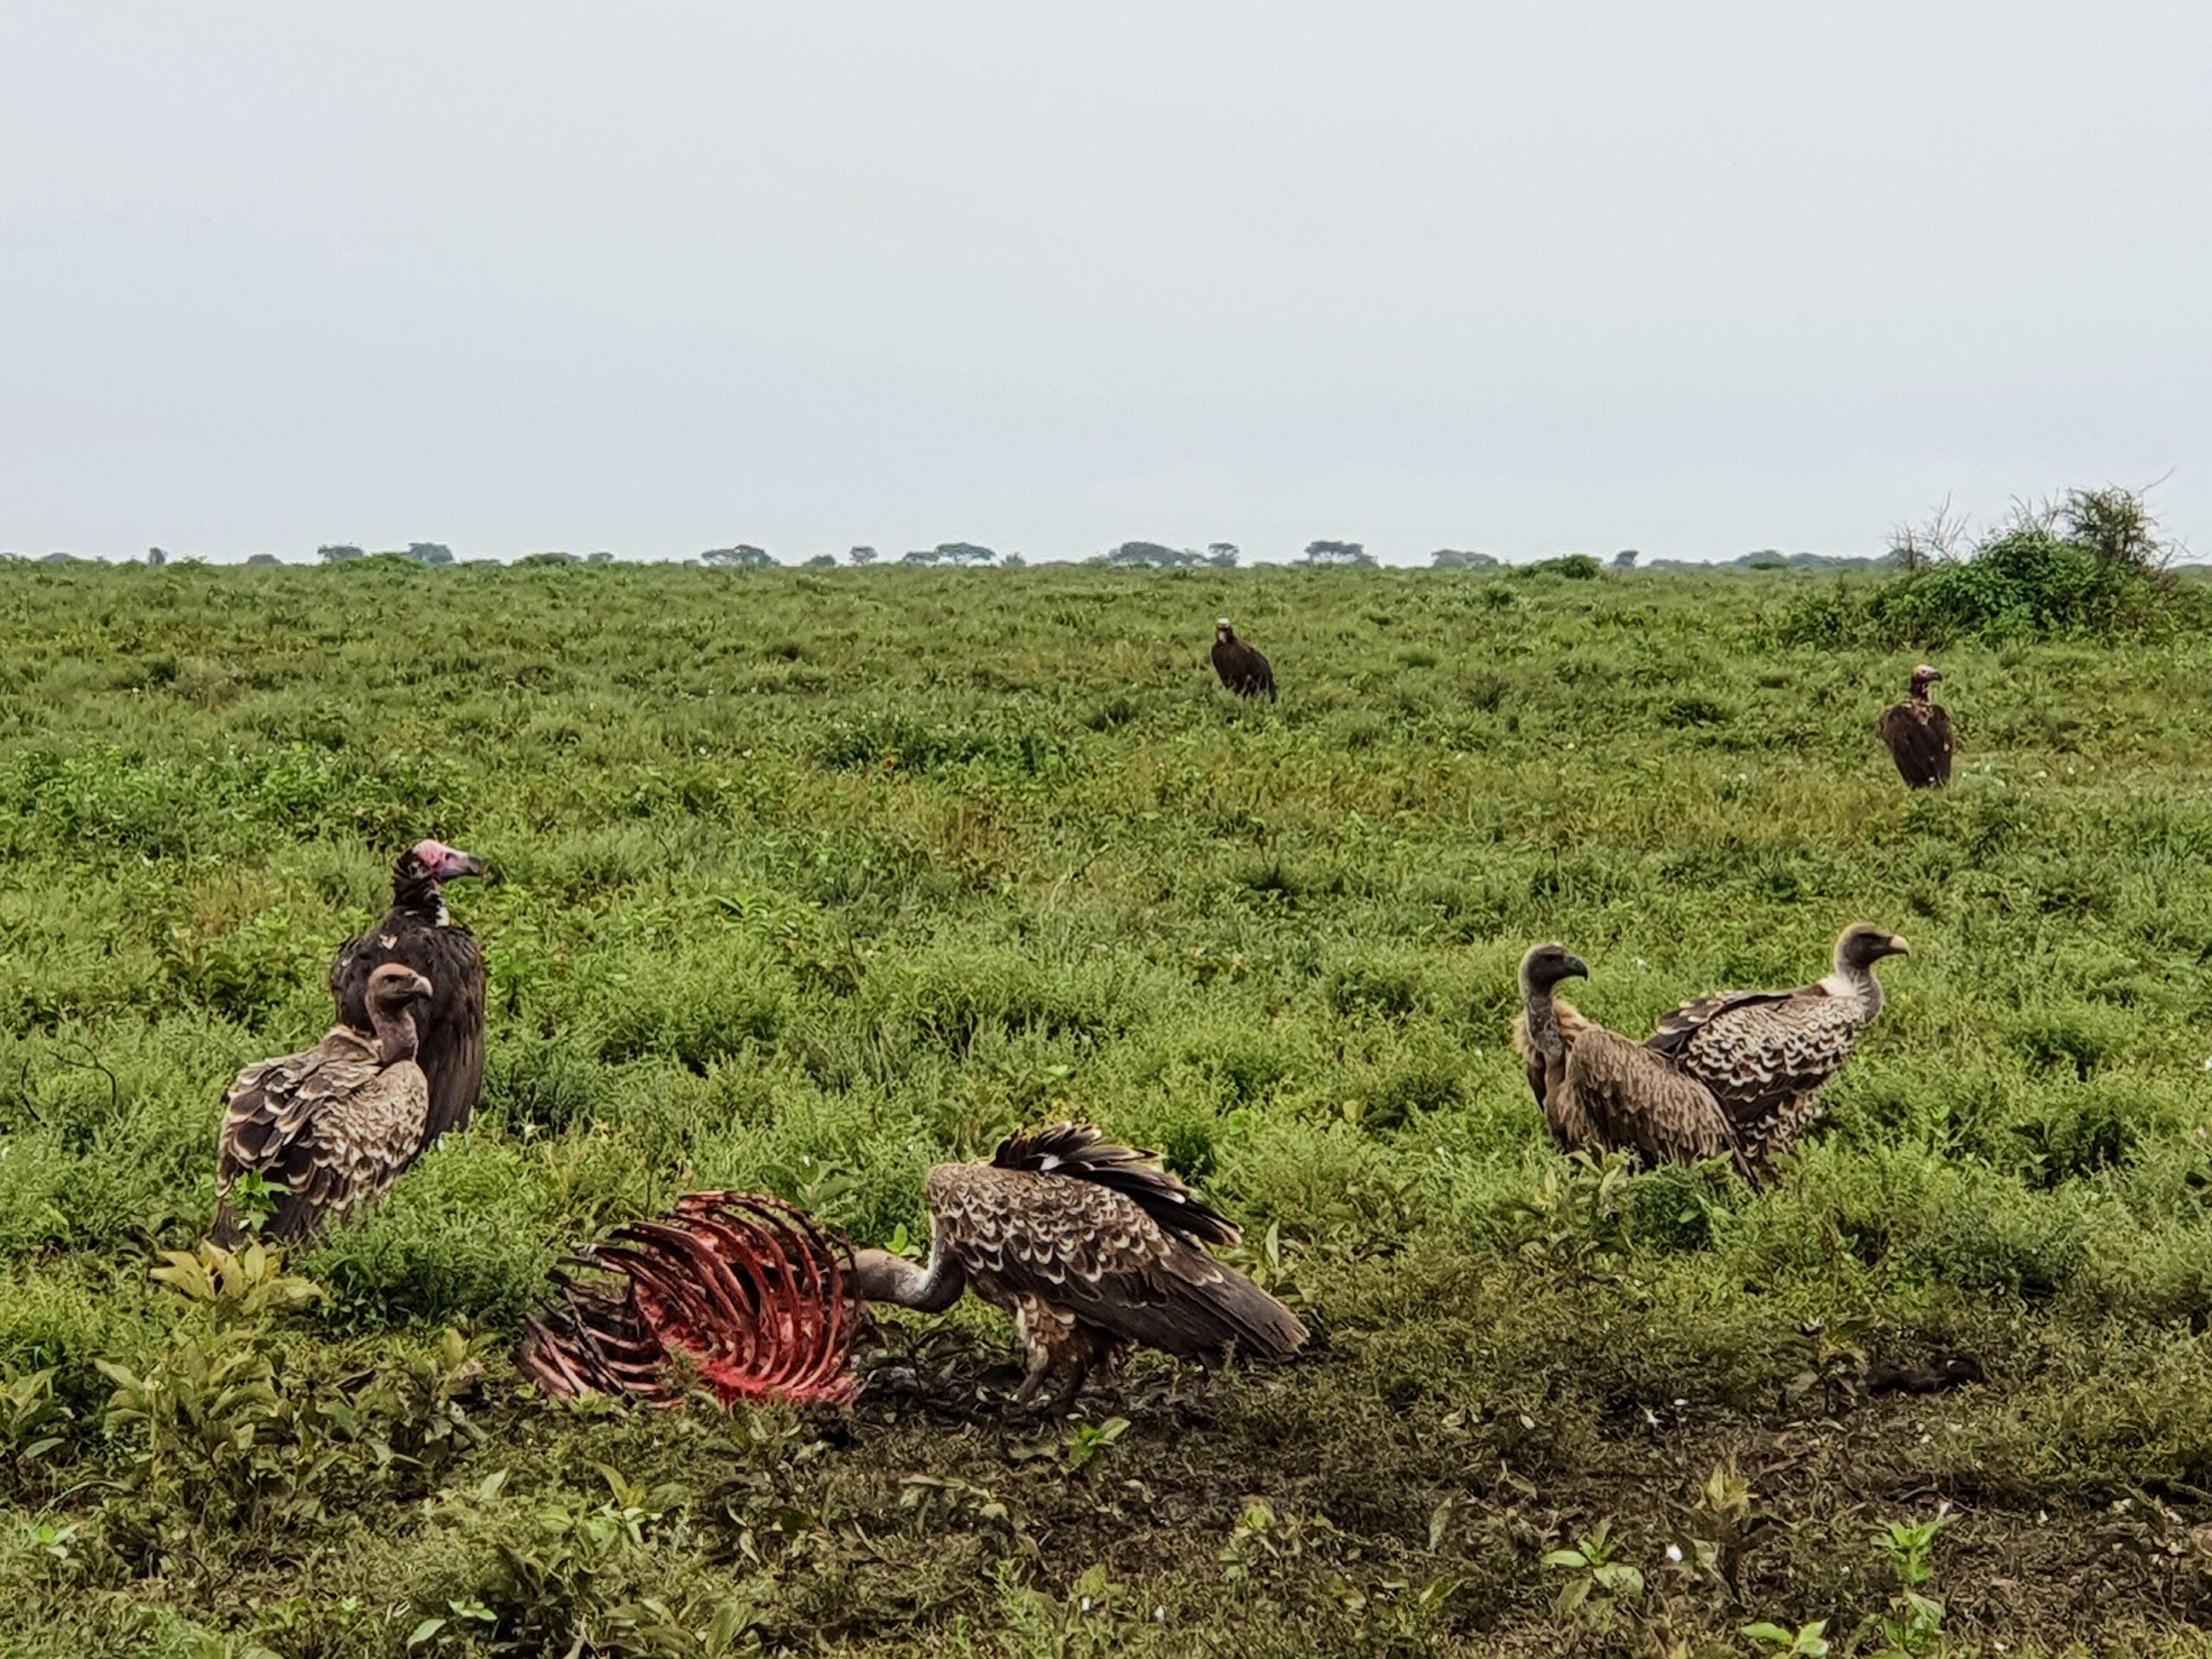 sepy-padlina-ptaki